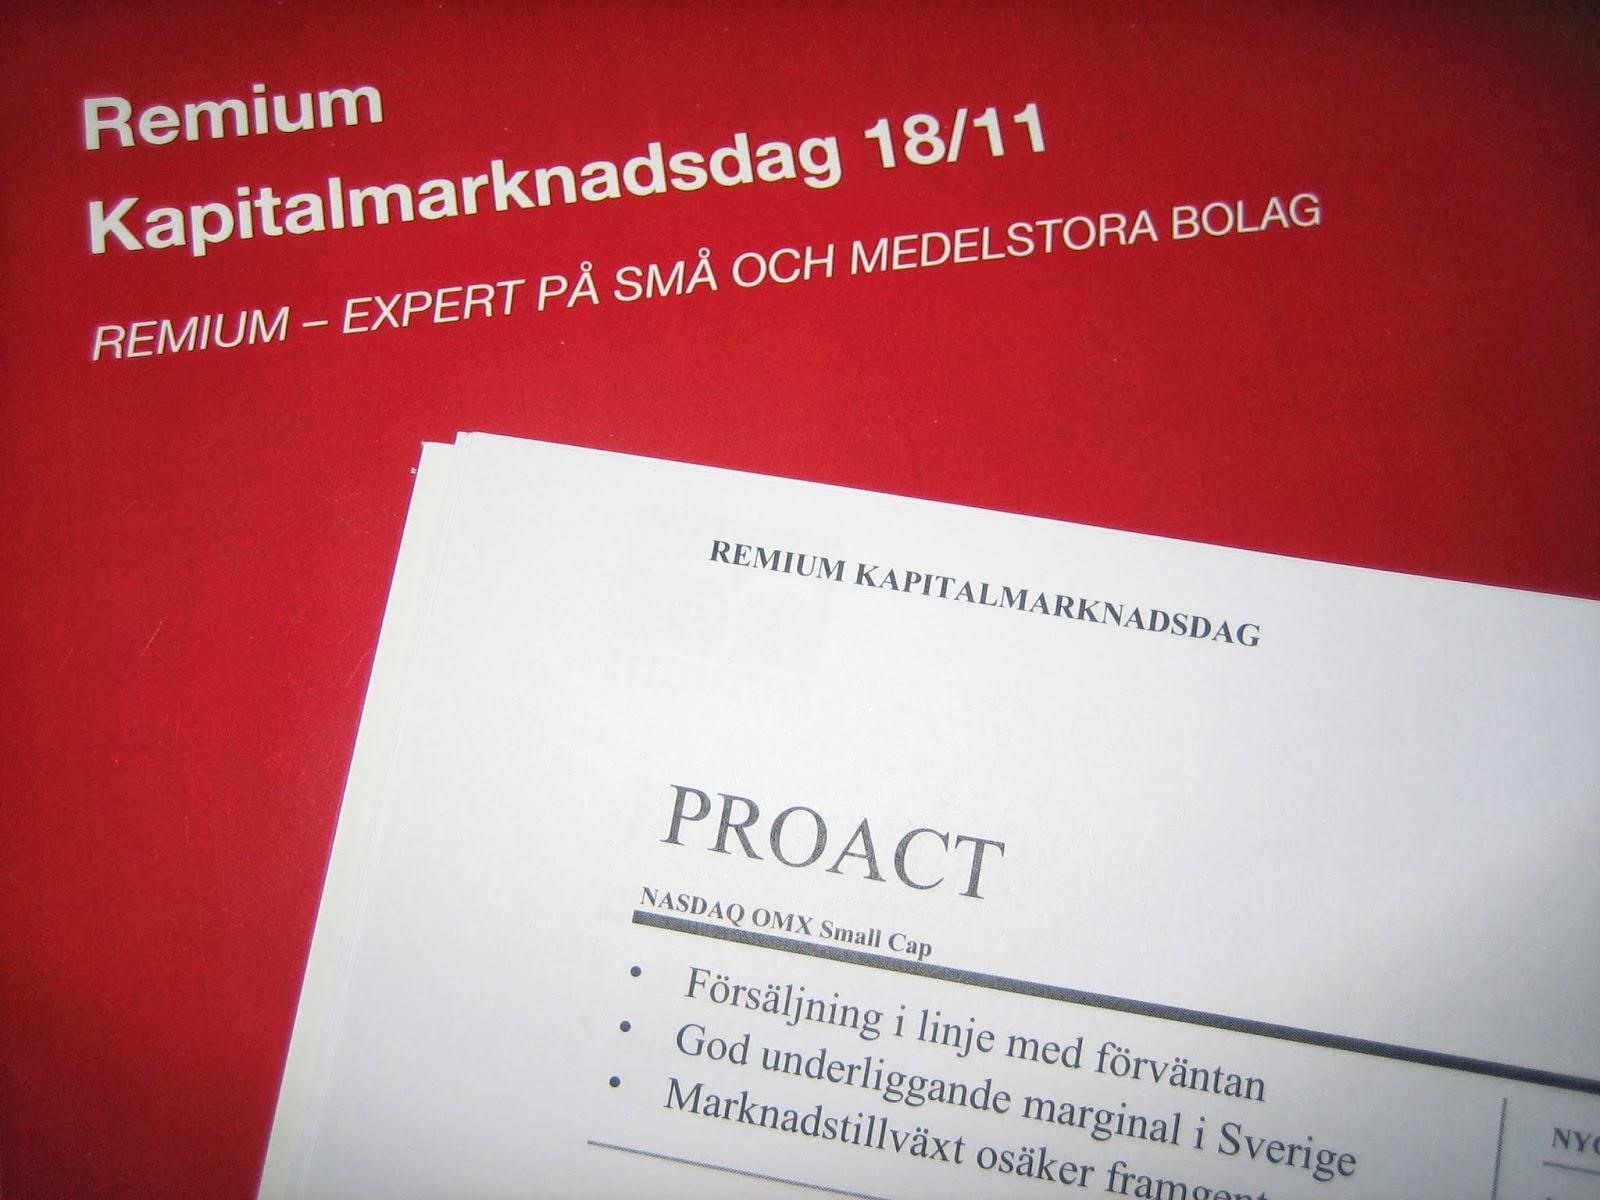 Proact it saljer bolag